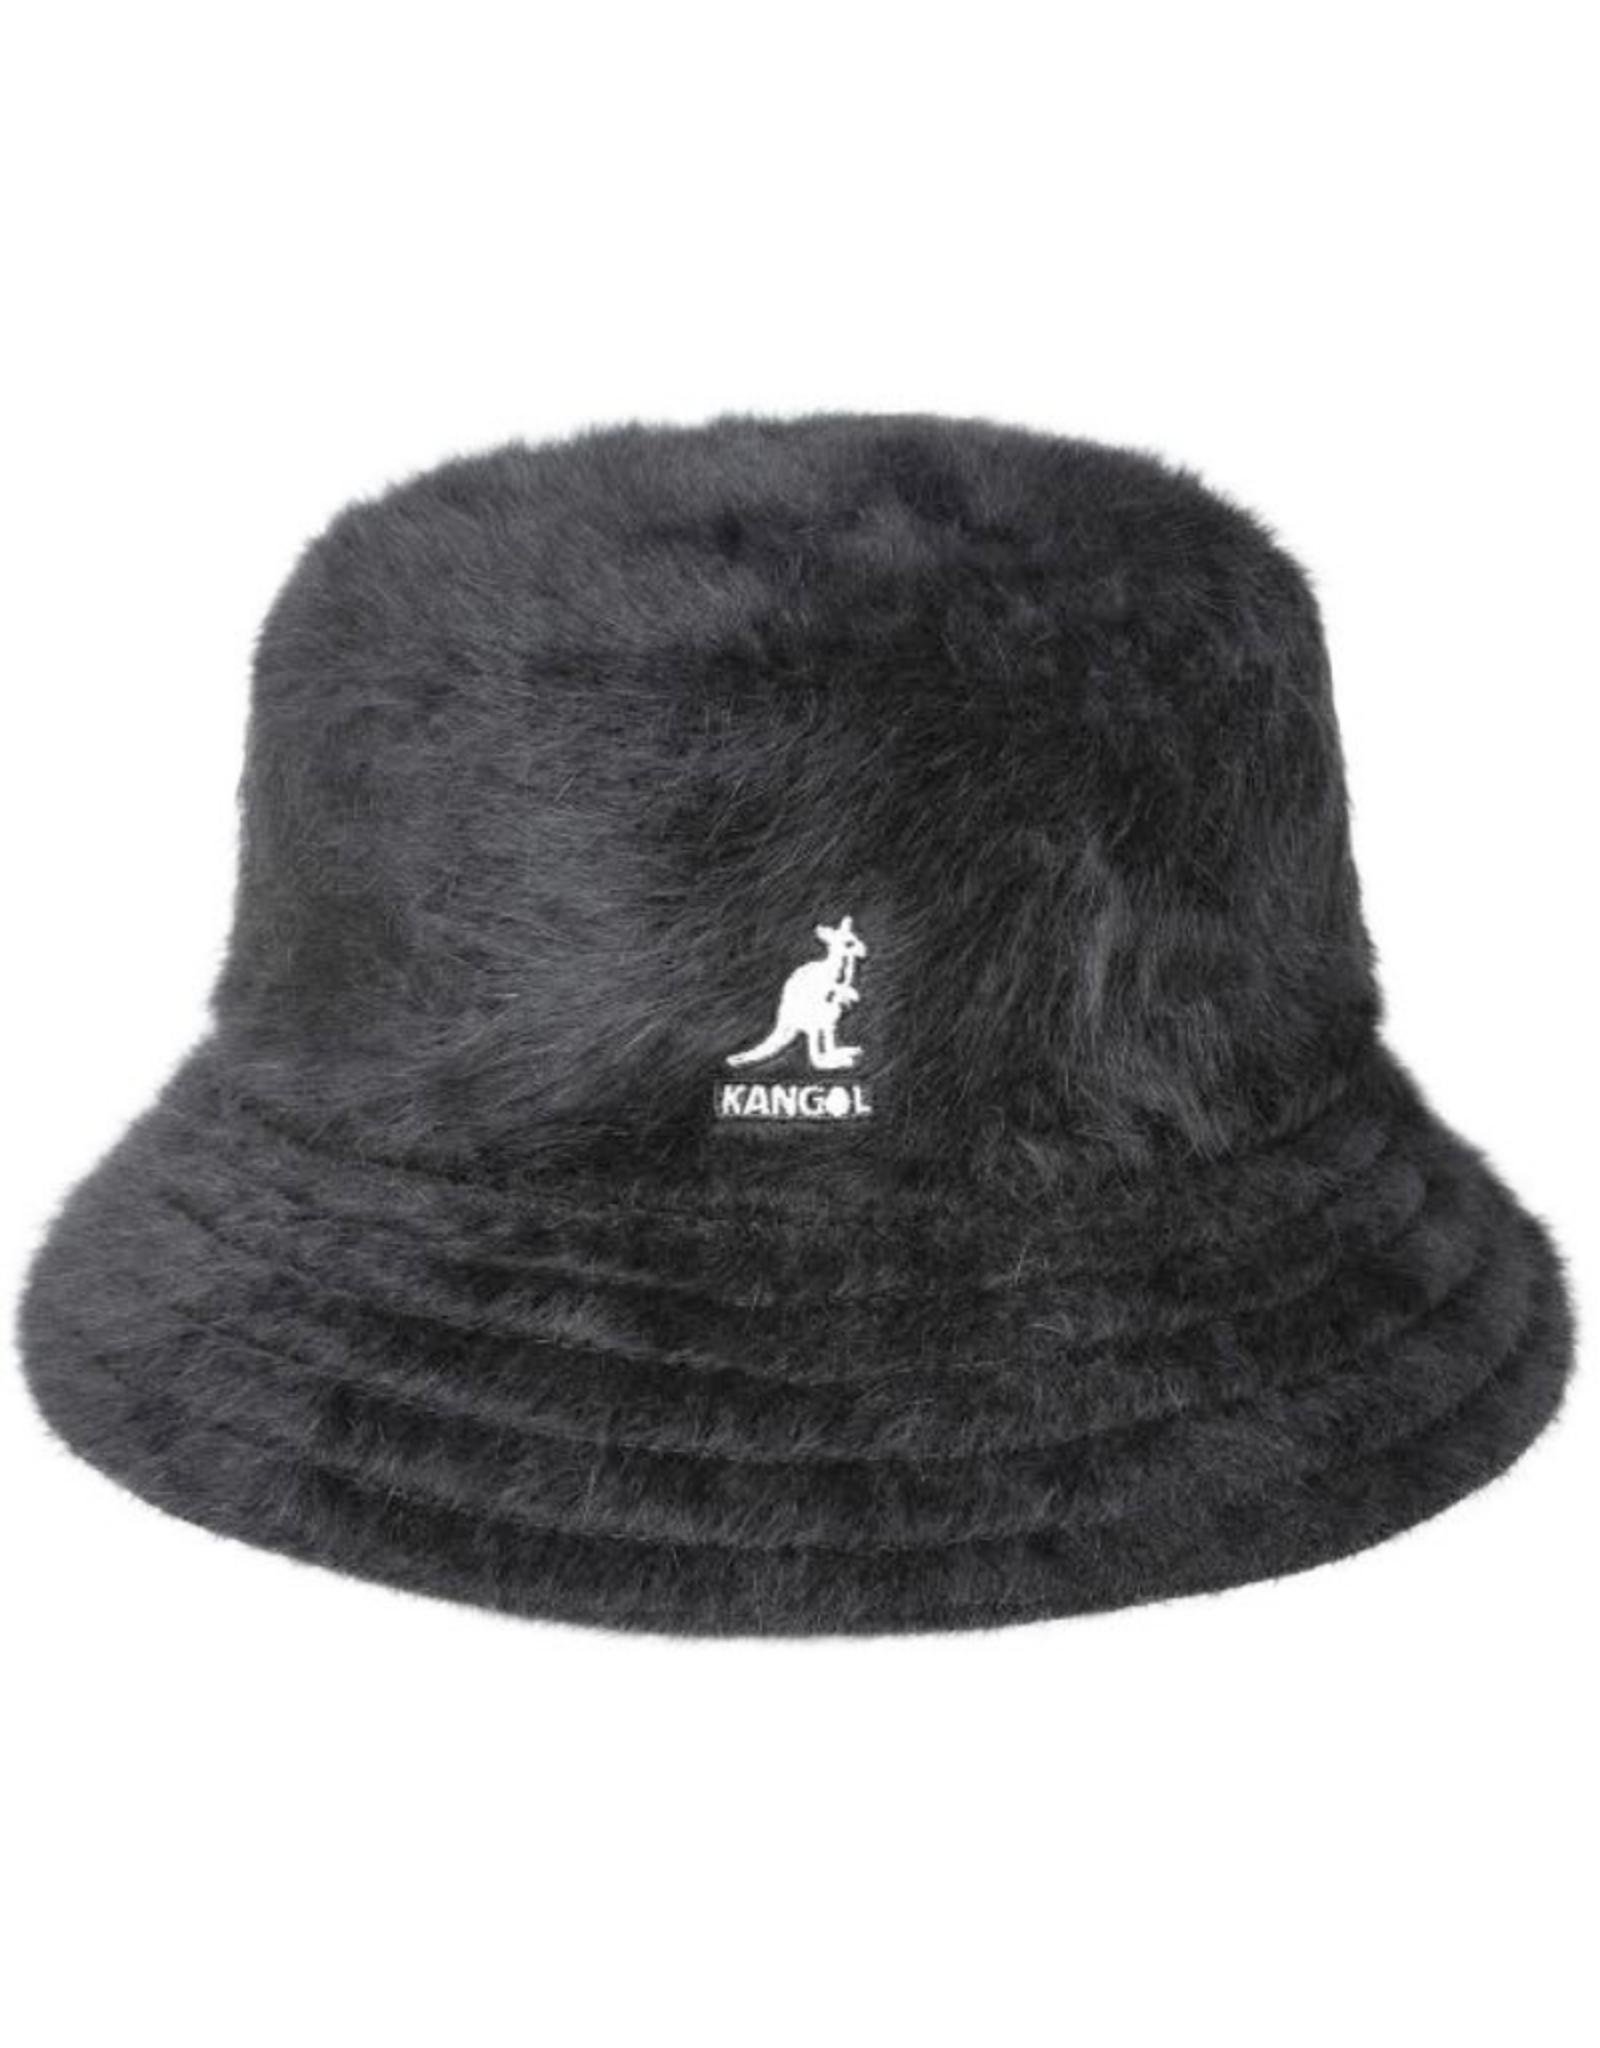 "Kangol HAT-BUCKET ""FURGORA BUCKET"" ANGORA"